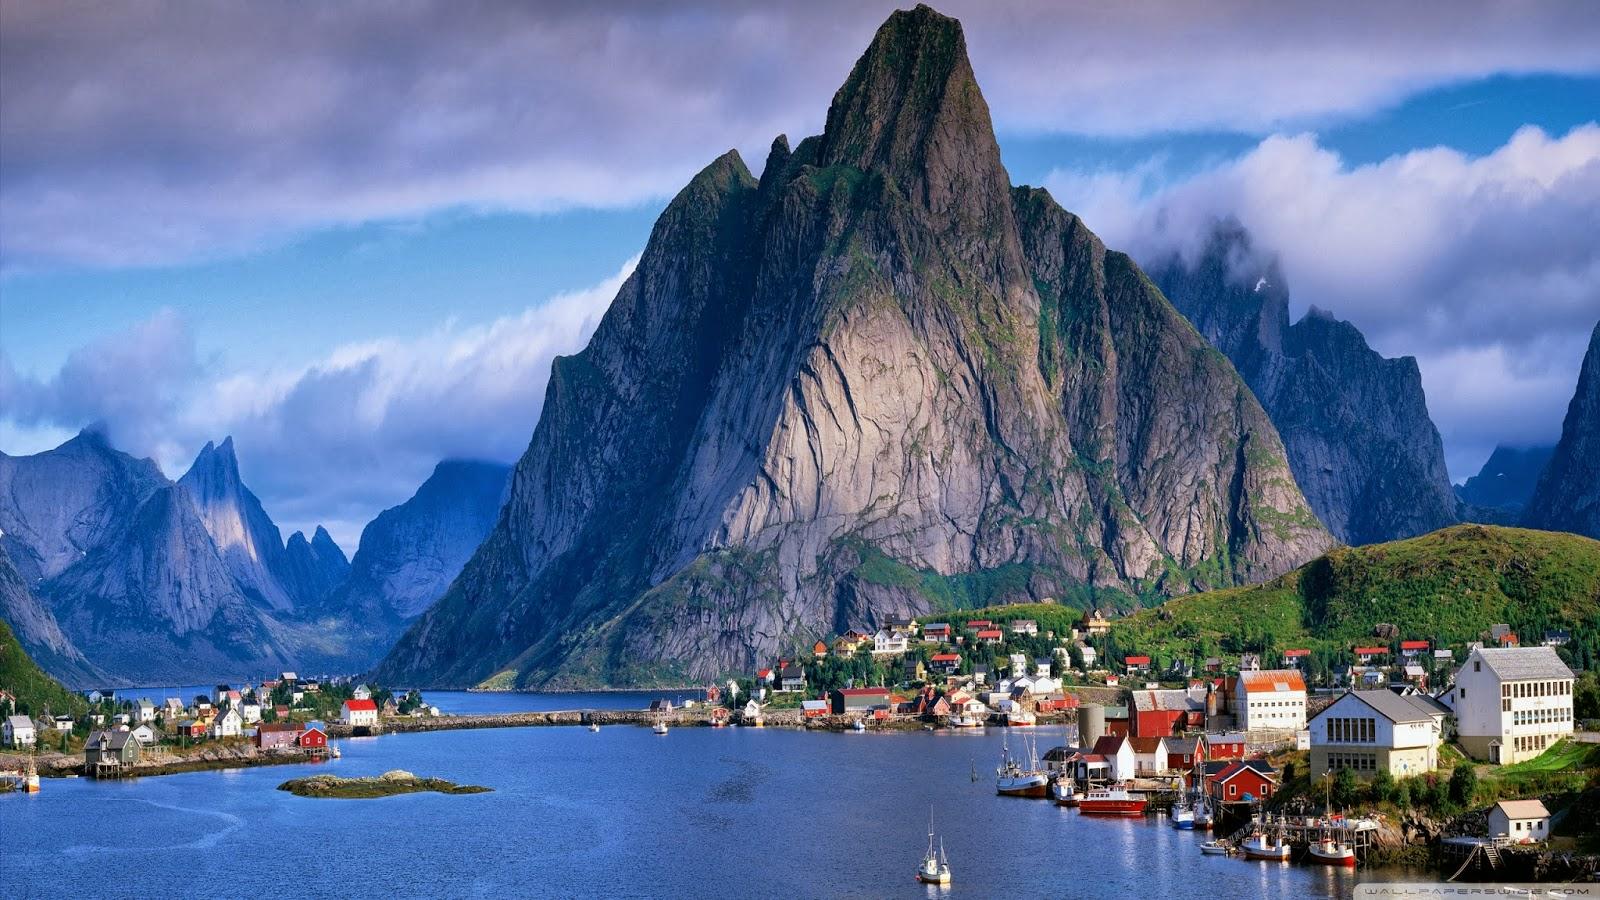 Wallpapers World Norway Scenery 2560 X 1440 Hd Wallpaper